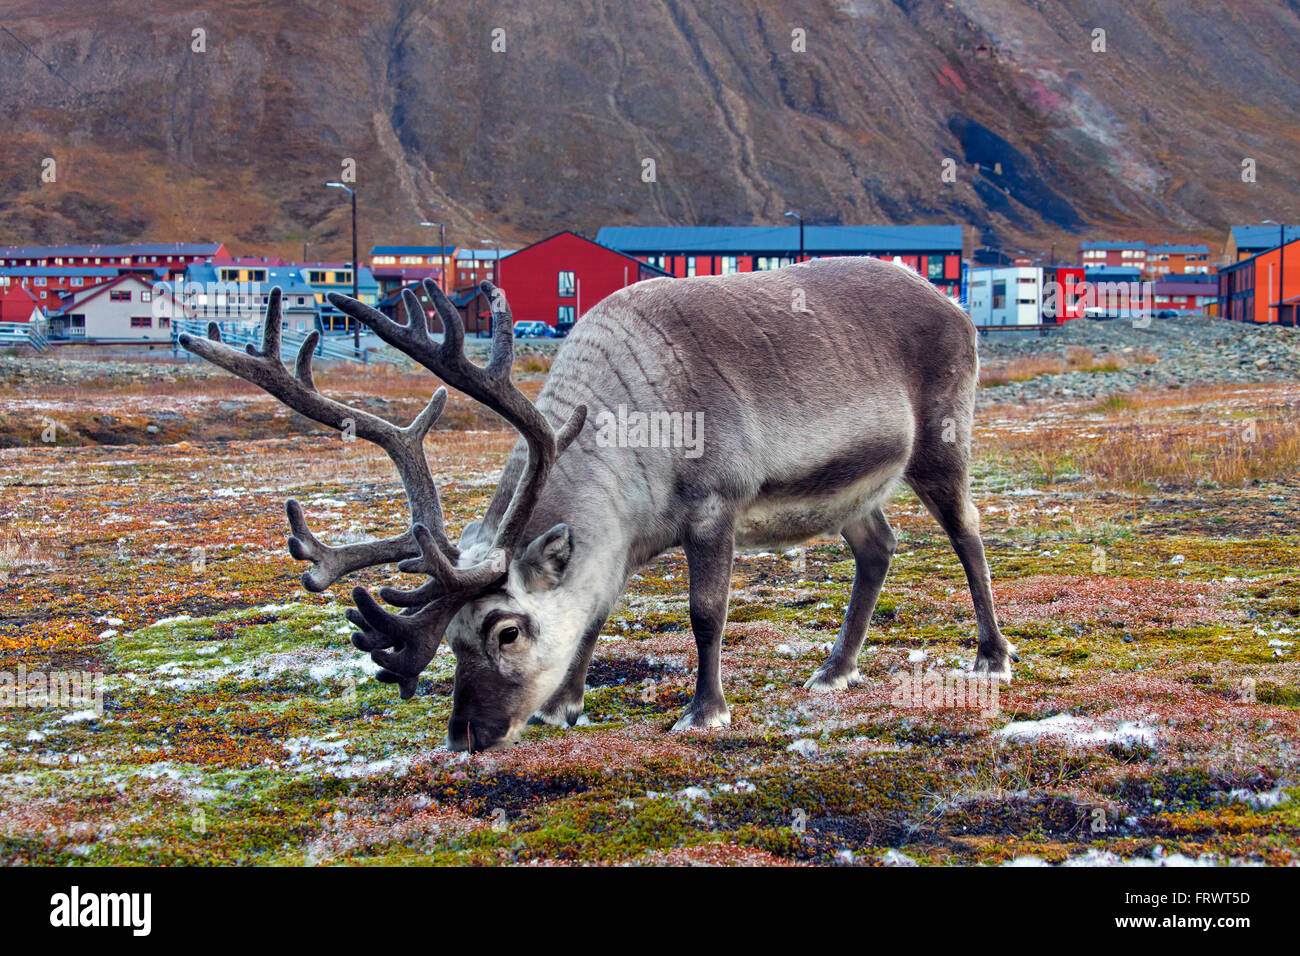 Renne du Svalbard (Rangifer tarandus platyrhynchus) pâturage bull à Longyearbyen Svalbard, Norvège Spitzberg / Banque D'Images